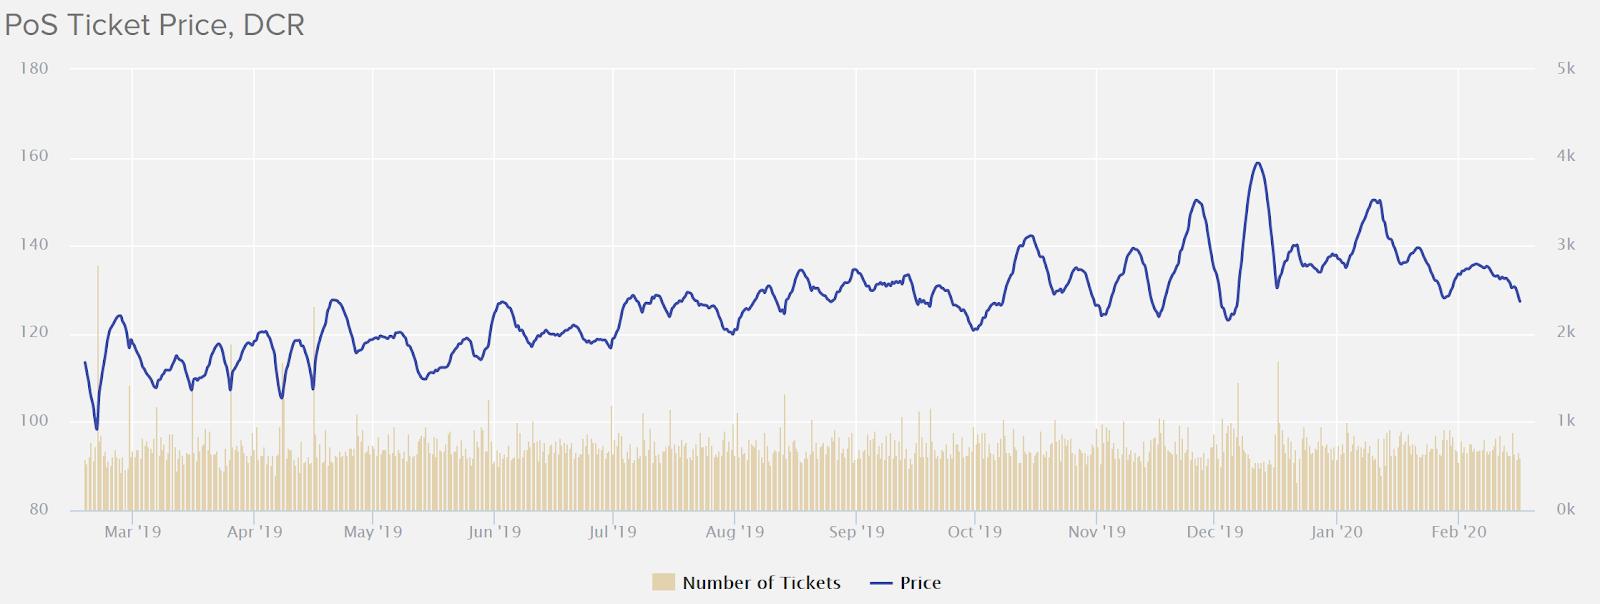 Decred Price Analysis 17 Feb 2020 (3)